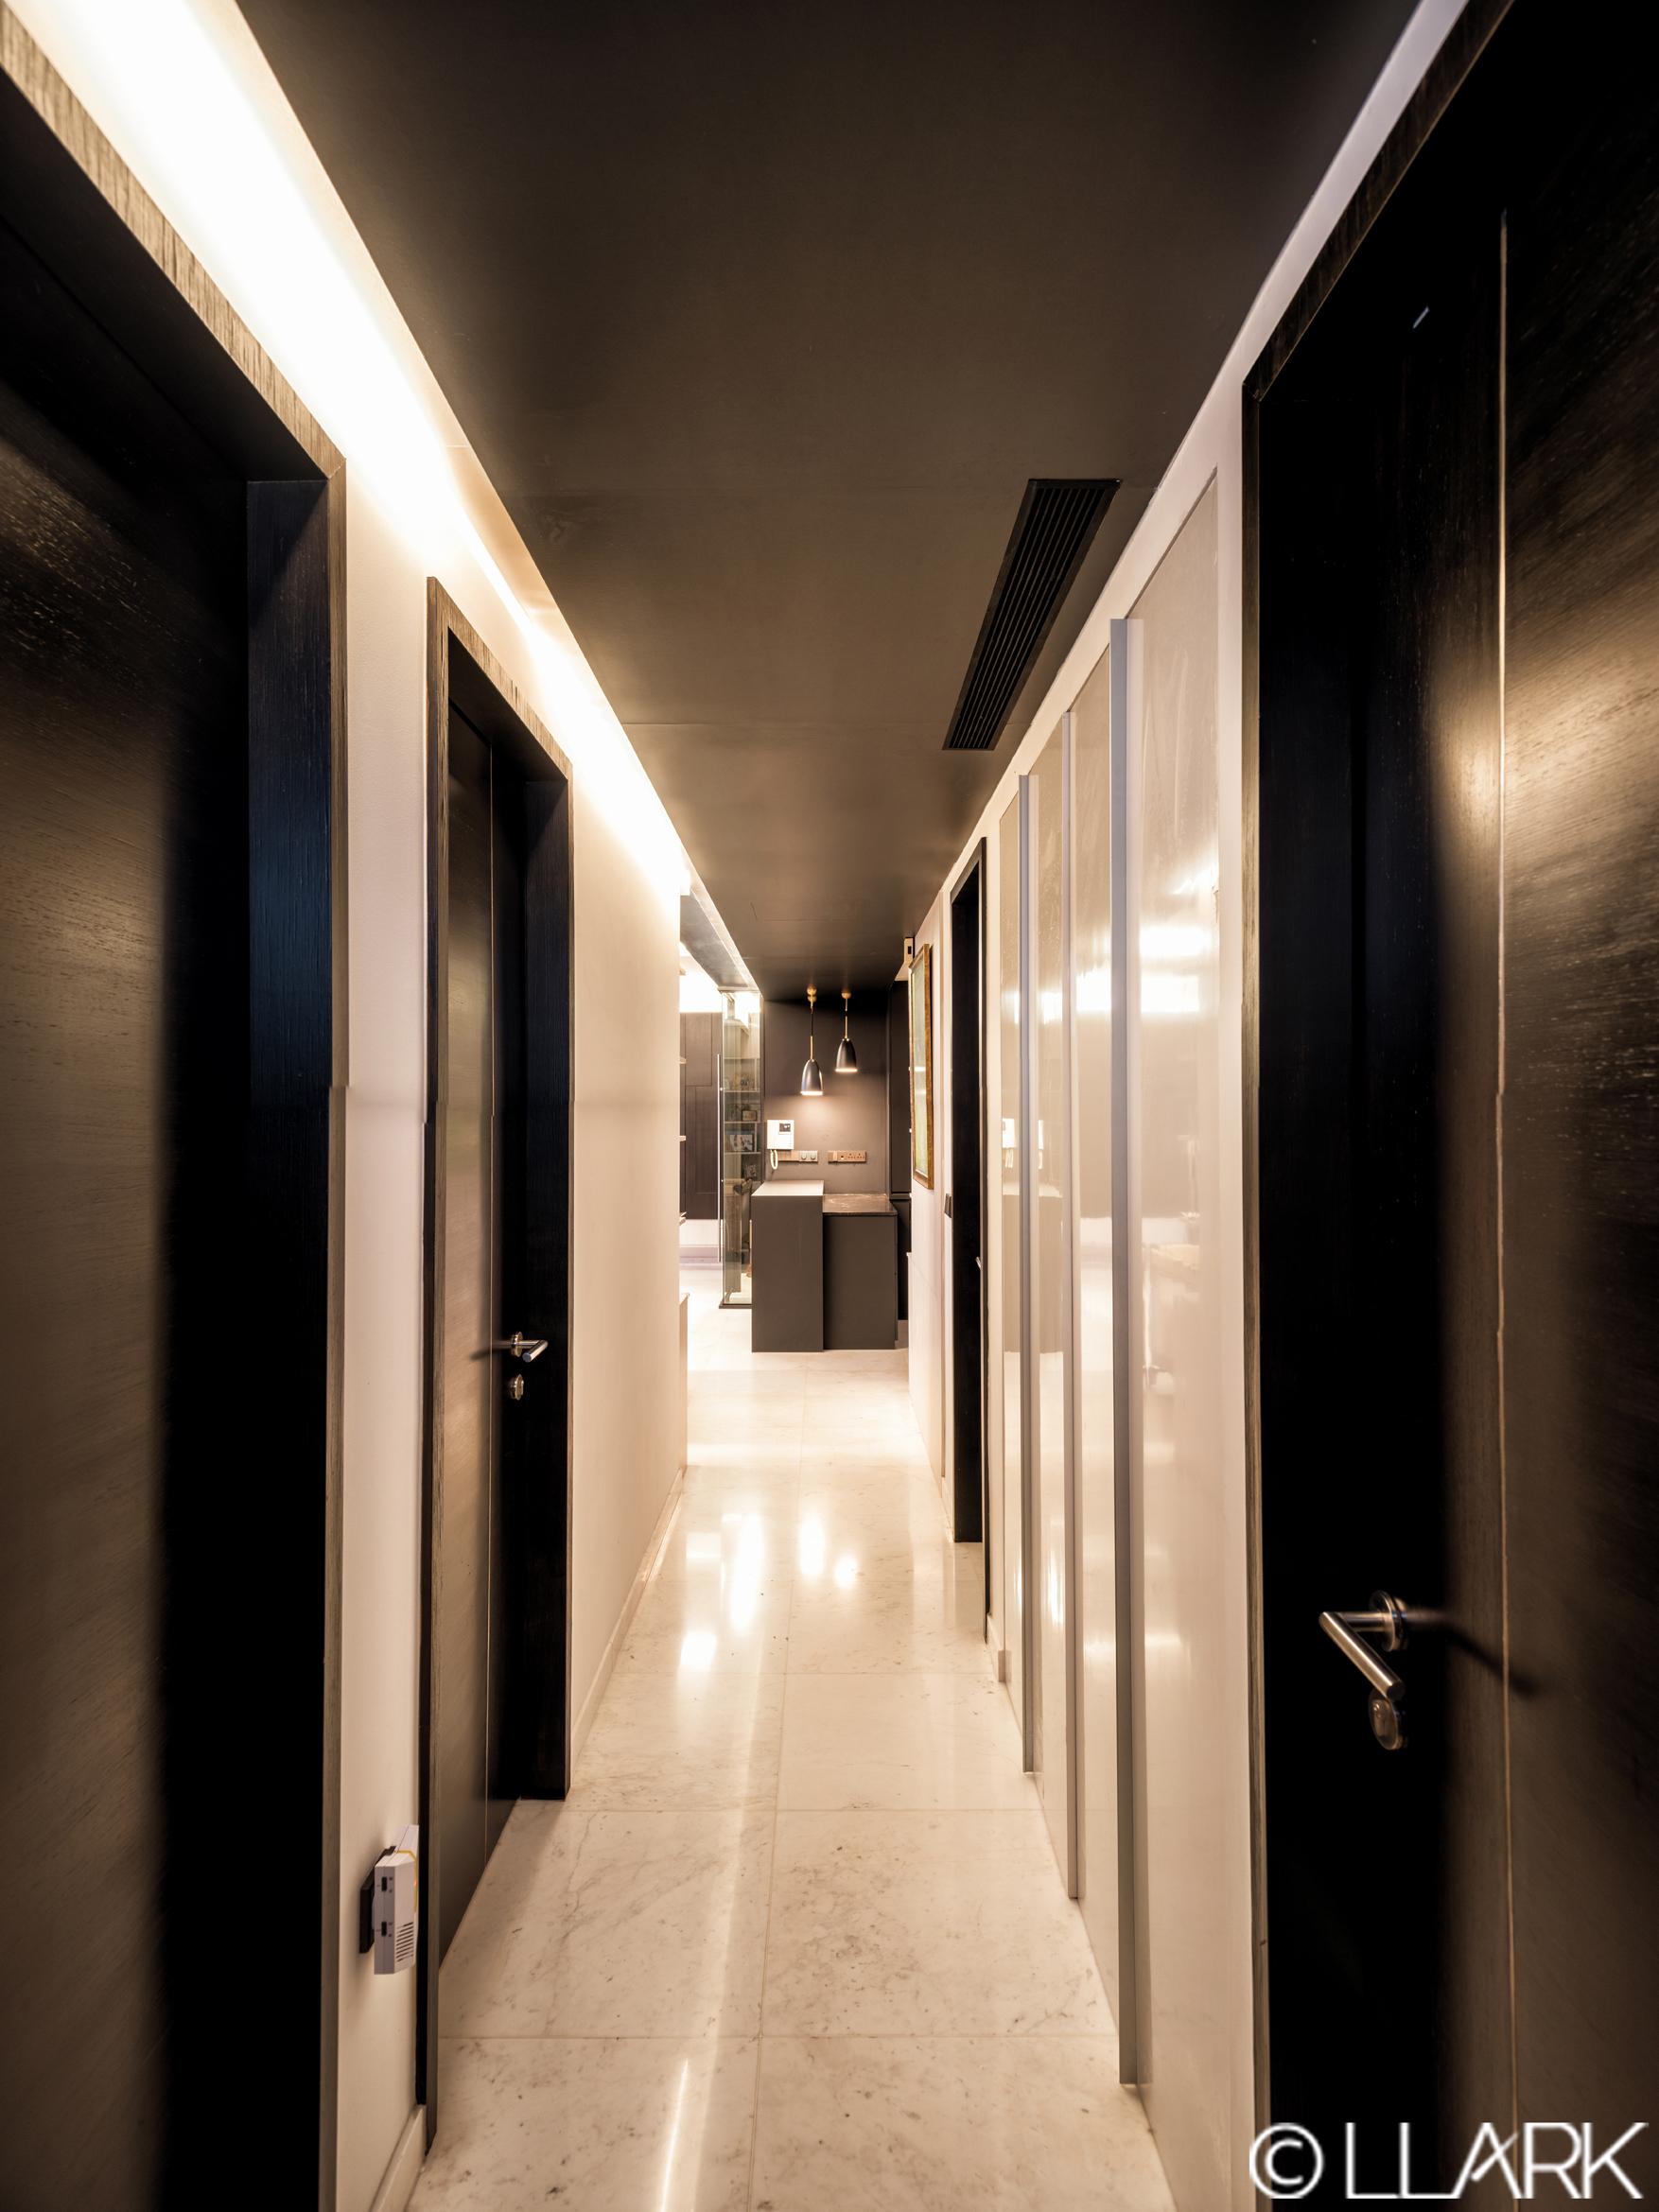 LLARK_AALTO_Corridor_R.jpg